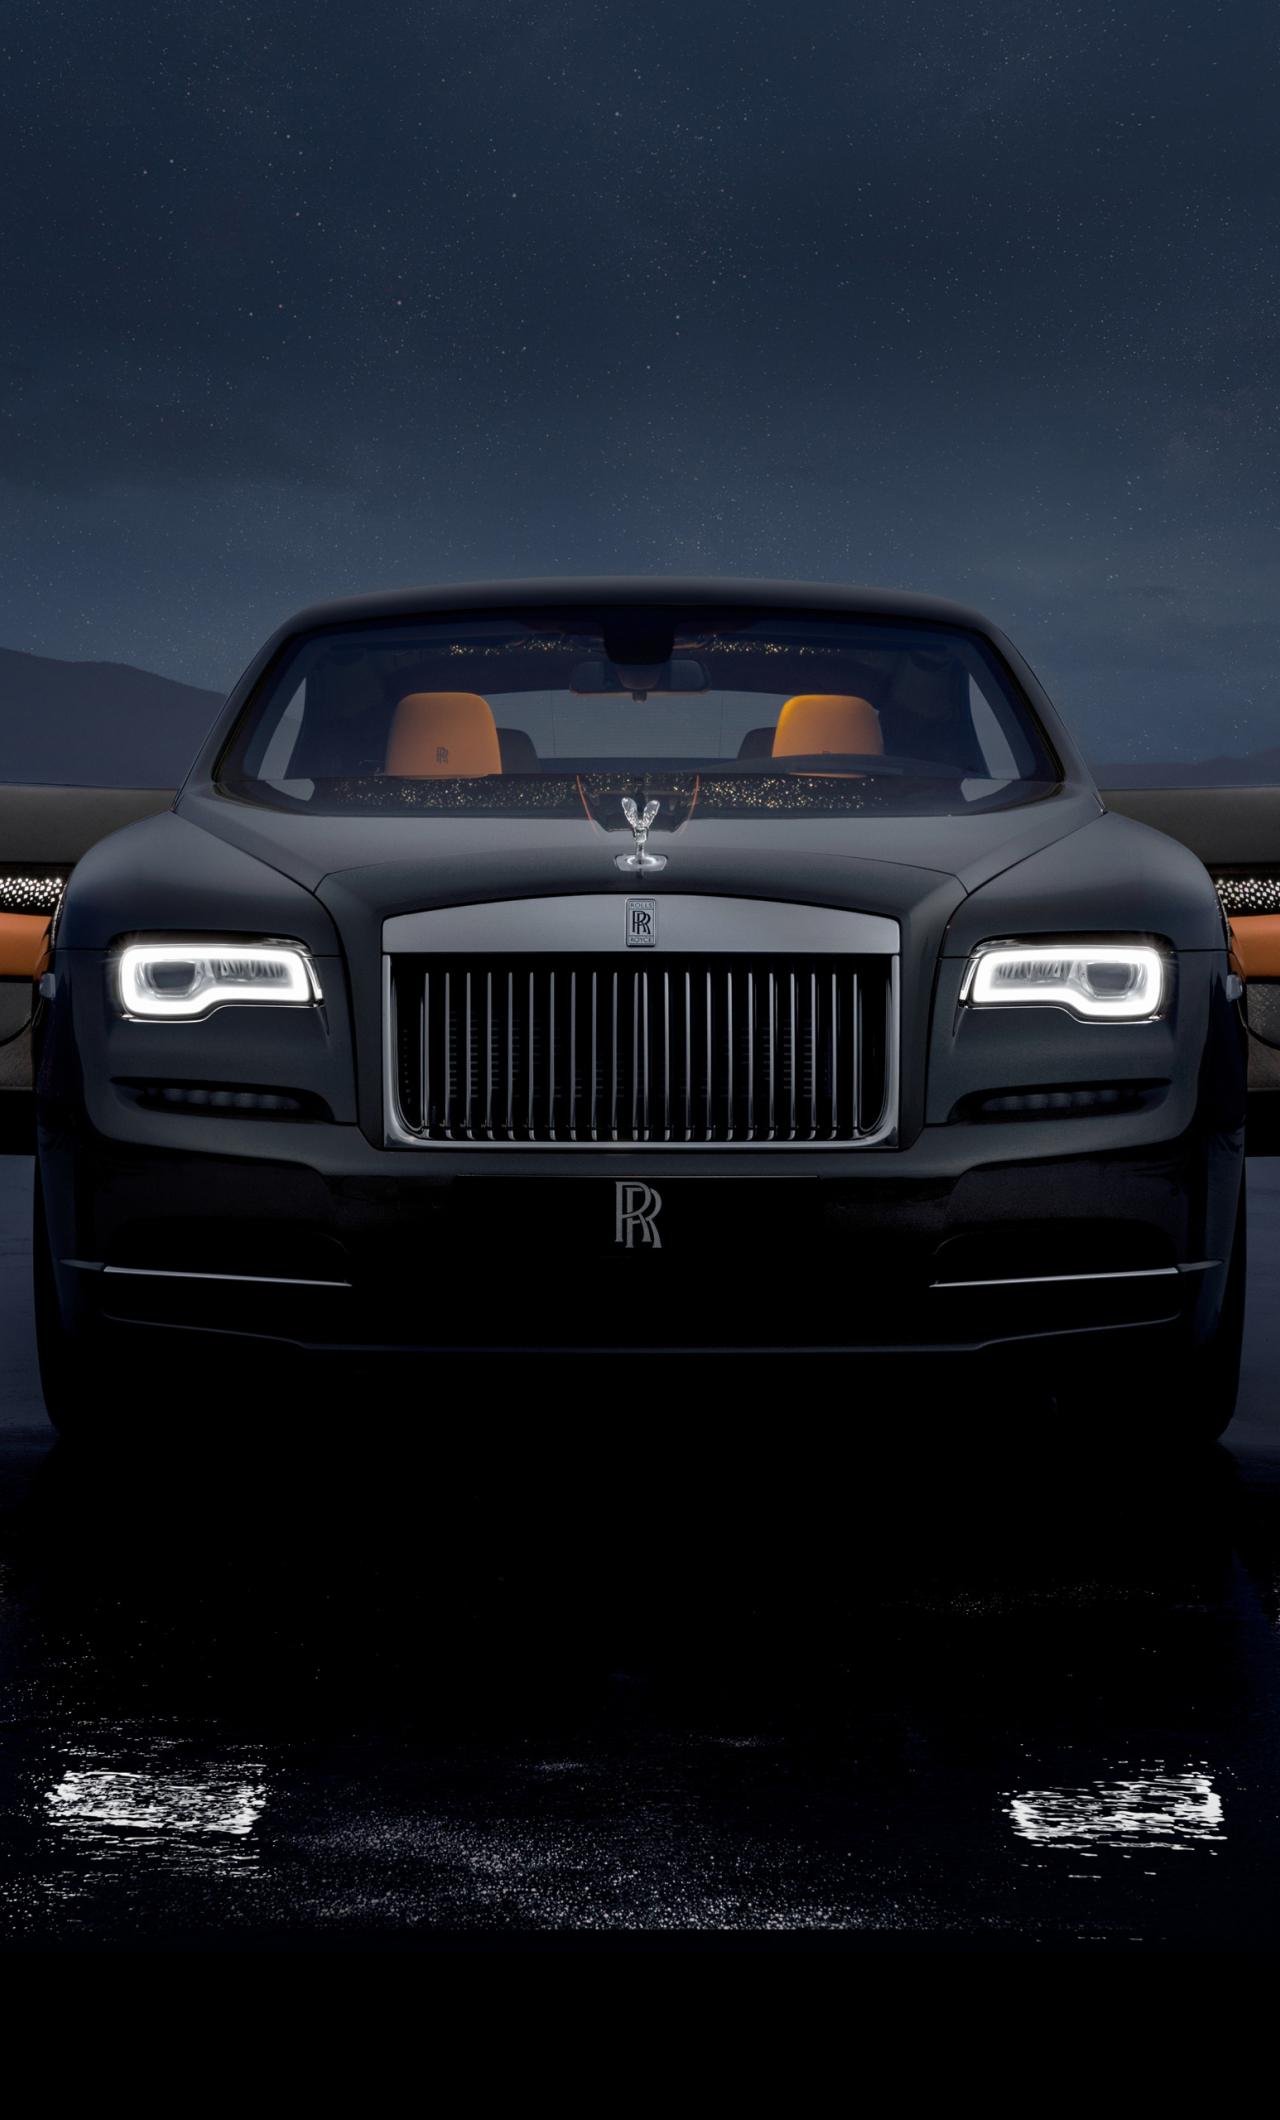 Rolls Royce Wraith Luminary Collection 2018, HD 4K Wallpaper